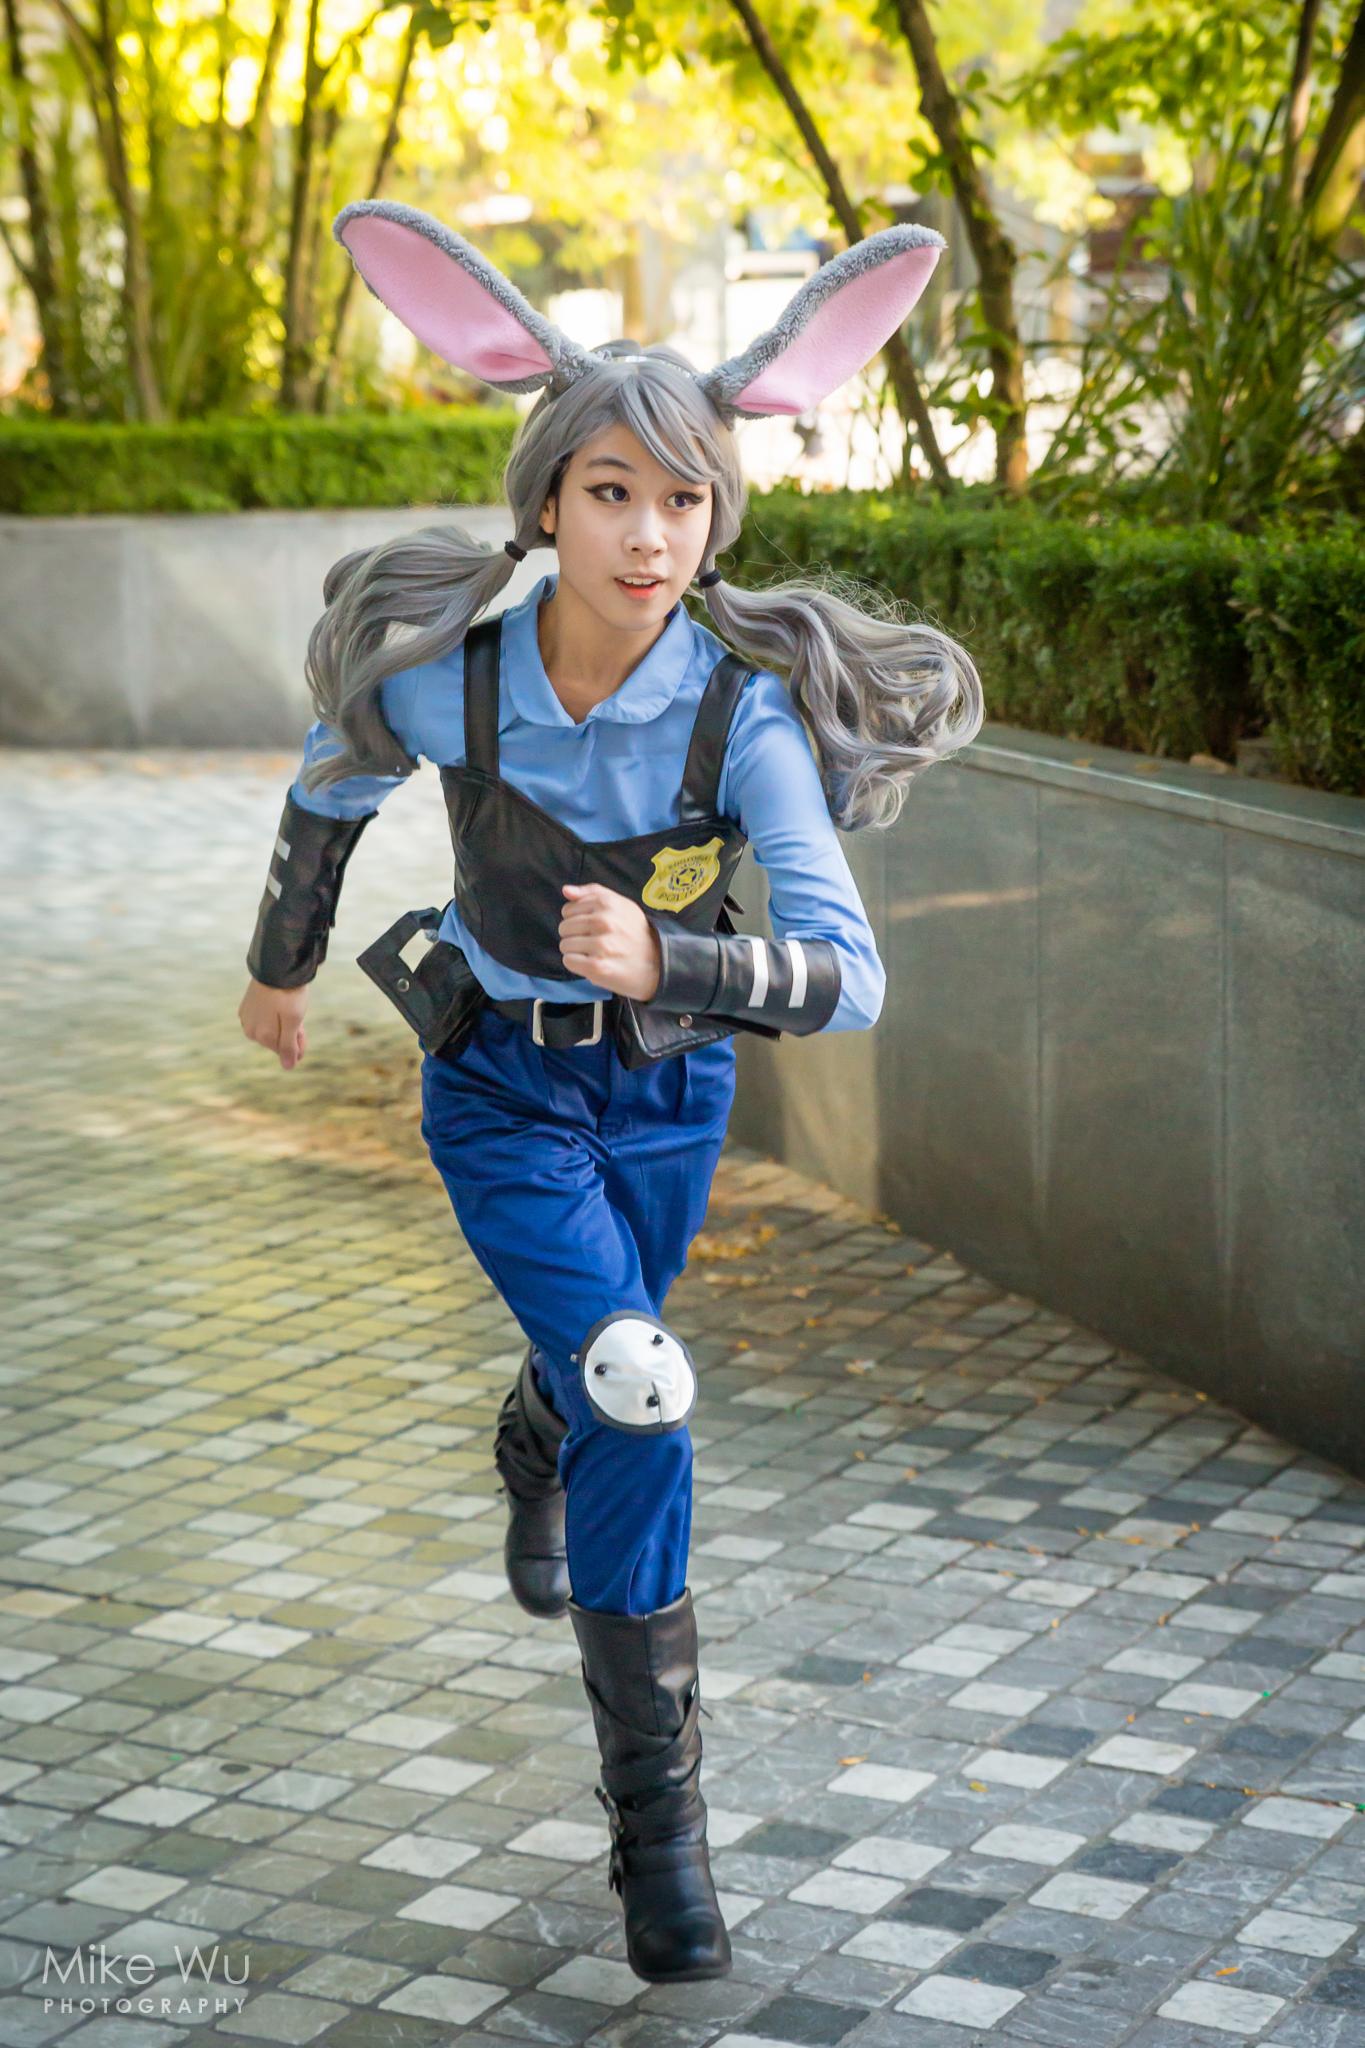 cosplay, judy hopps, zootopia, running, officer, bunny, movie, sprint, ears, badge